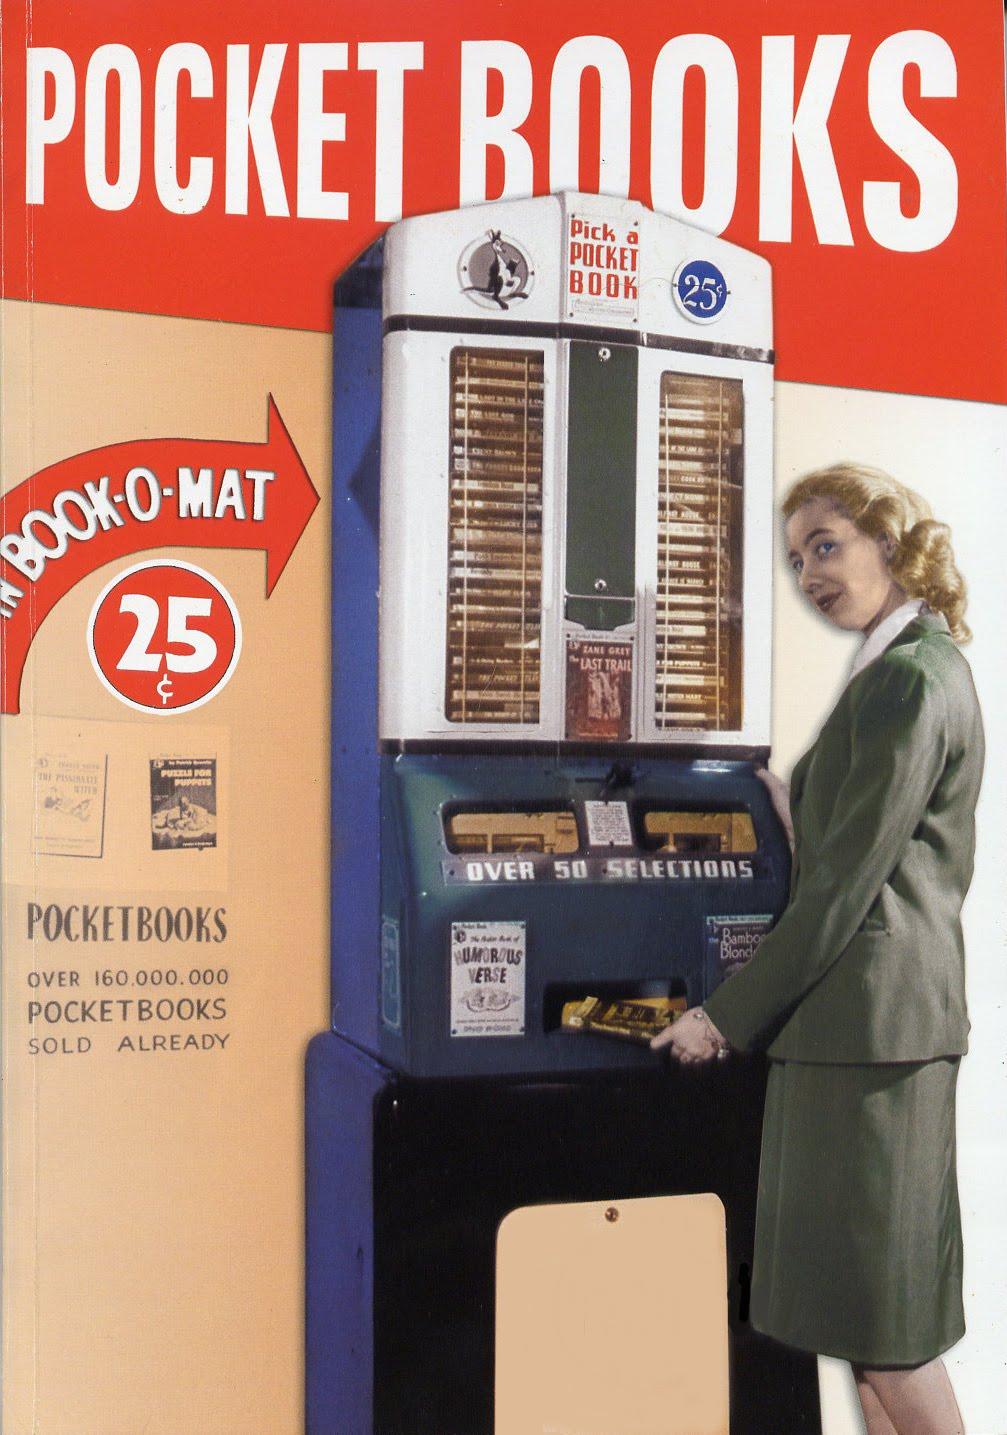 2013-03-24-bookomatvendingmachine1949viaandthe.jpg